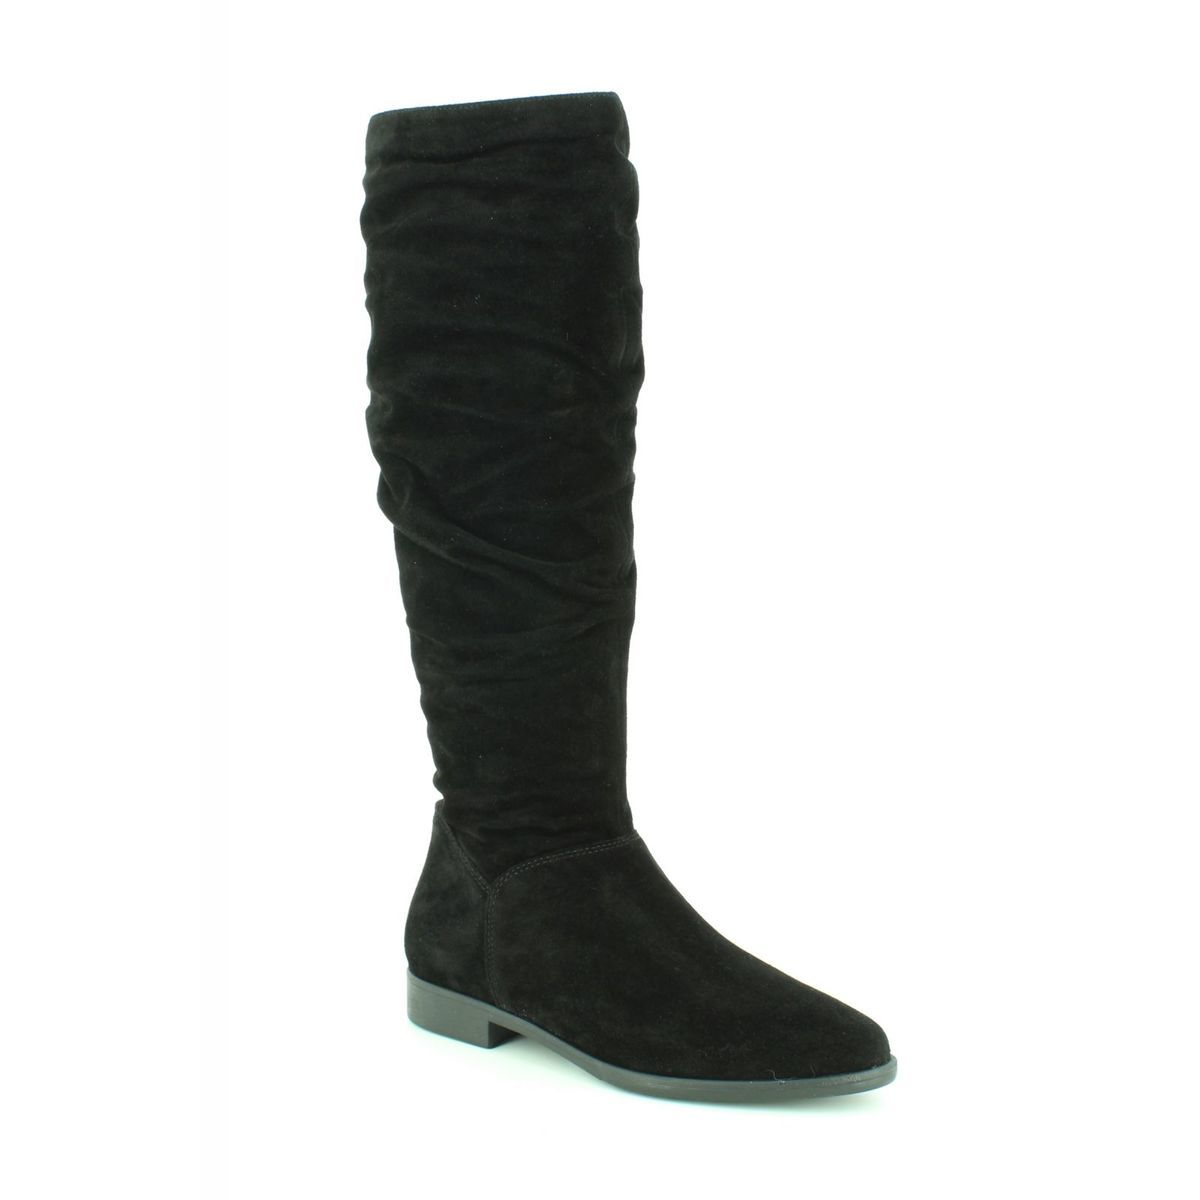 f2643056590 Tamaris Knee-high Boots - Black suede - 25546 21 001 GESIN LONG